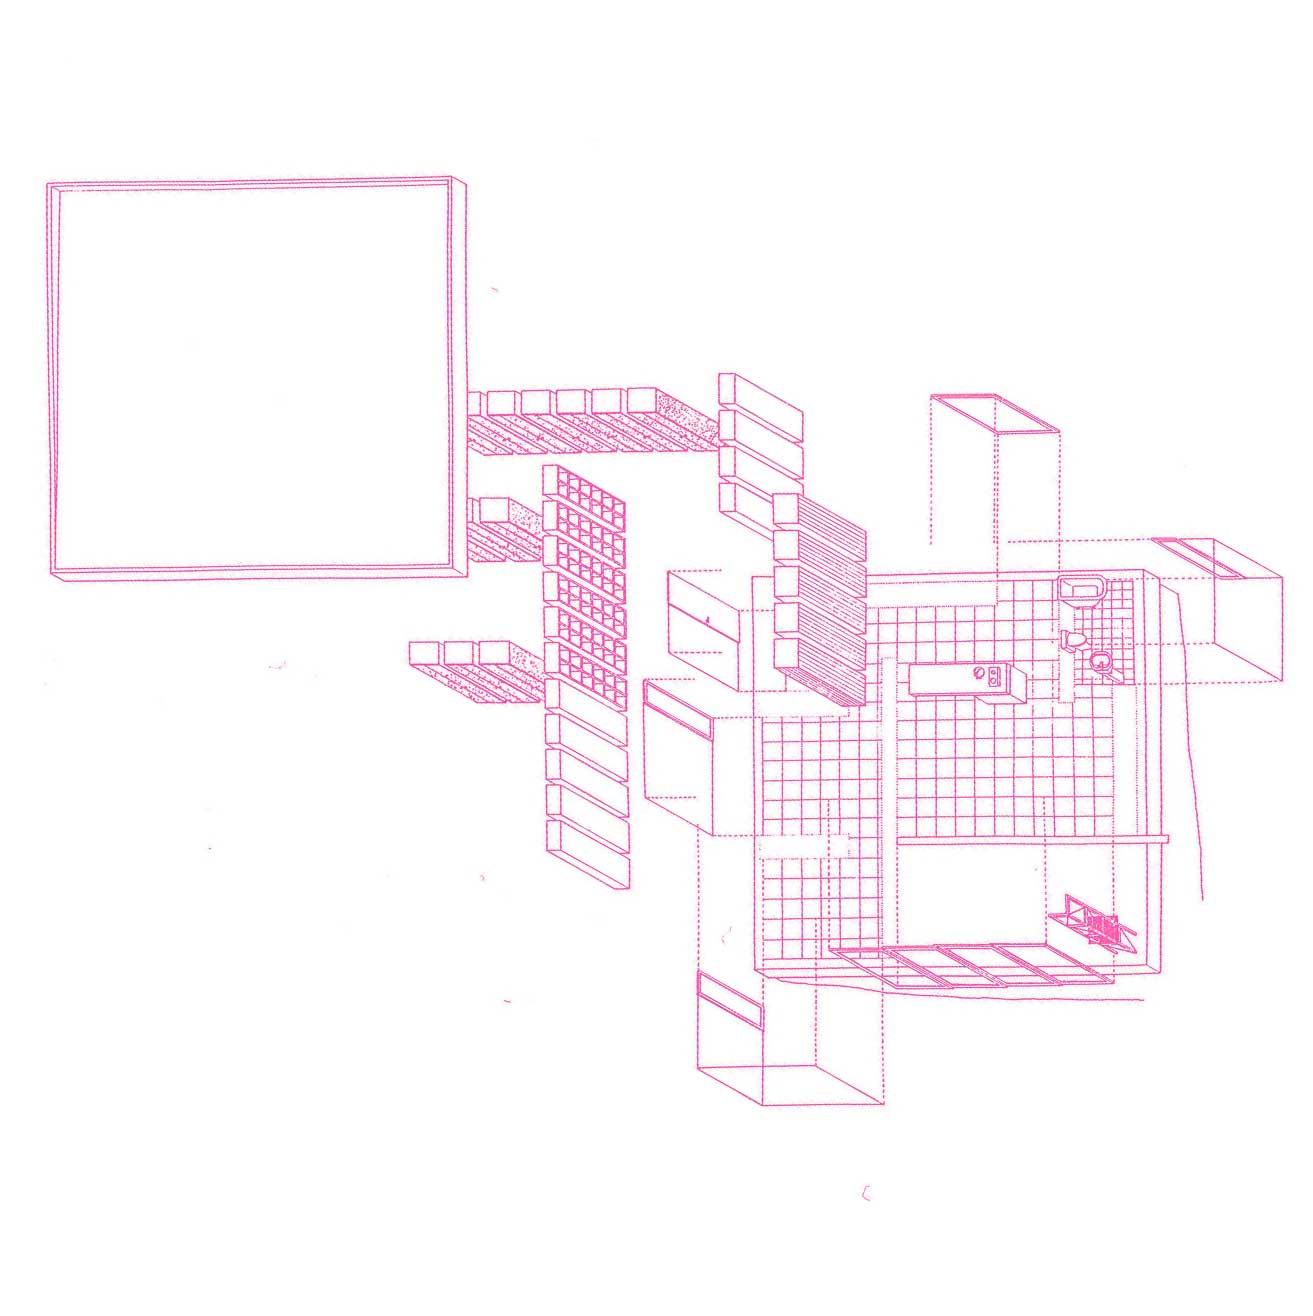 casa-mobiliario-esquema